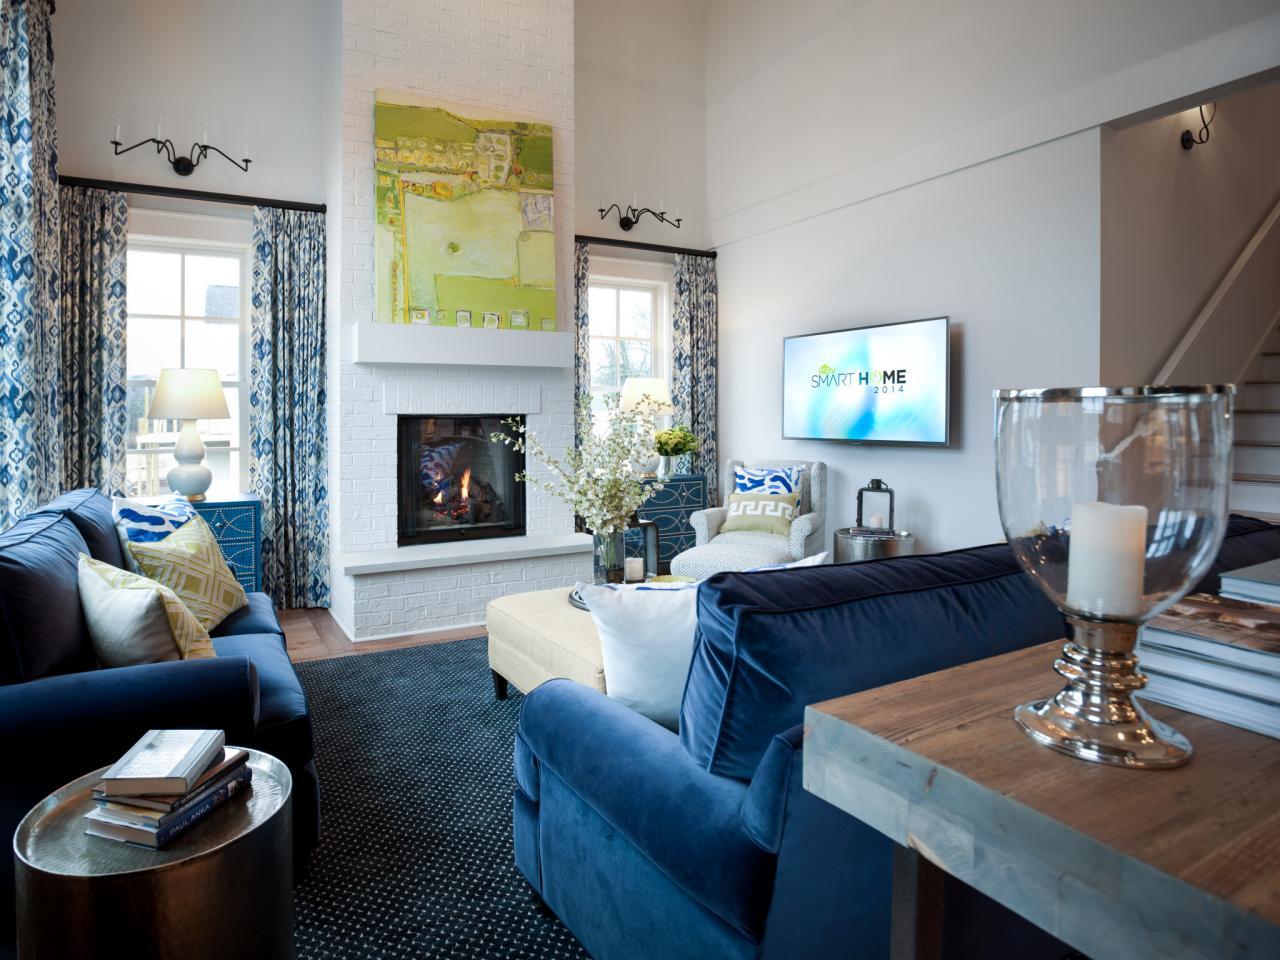 Pick Your Favorite Great Room | HGTV Smart Home 2018 | HGTV